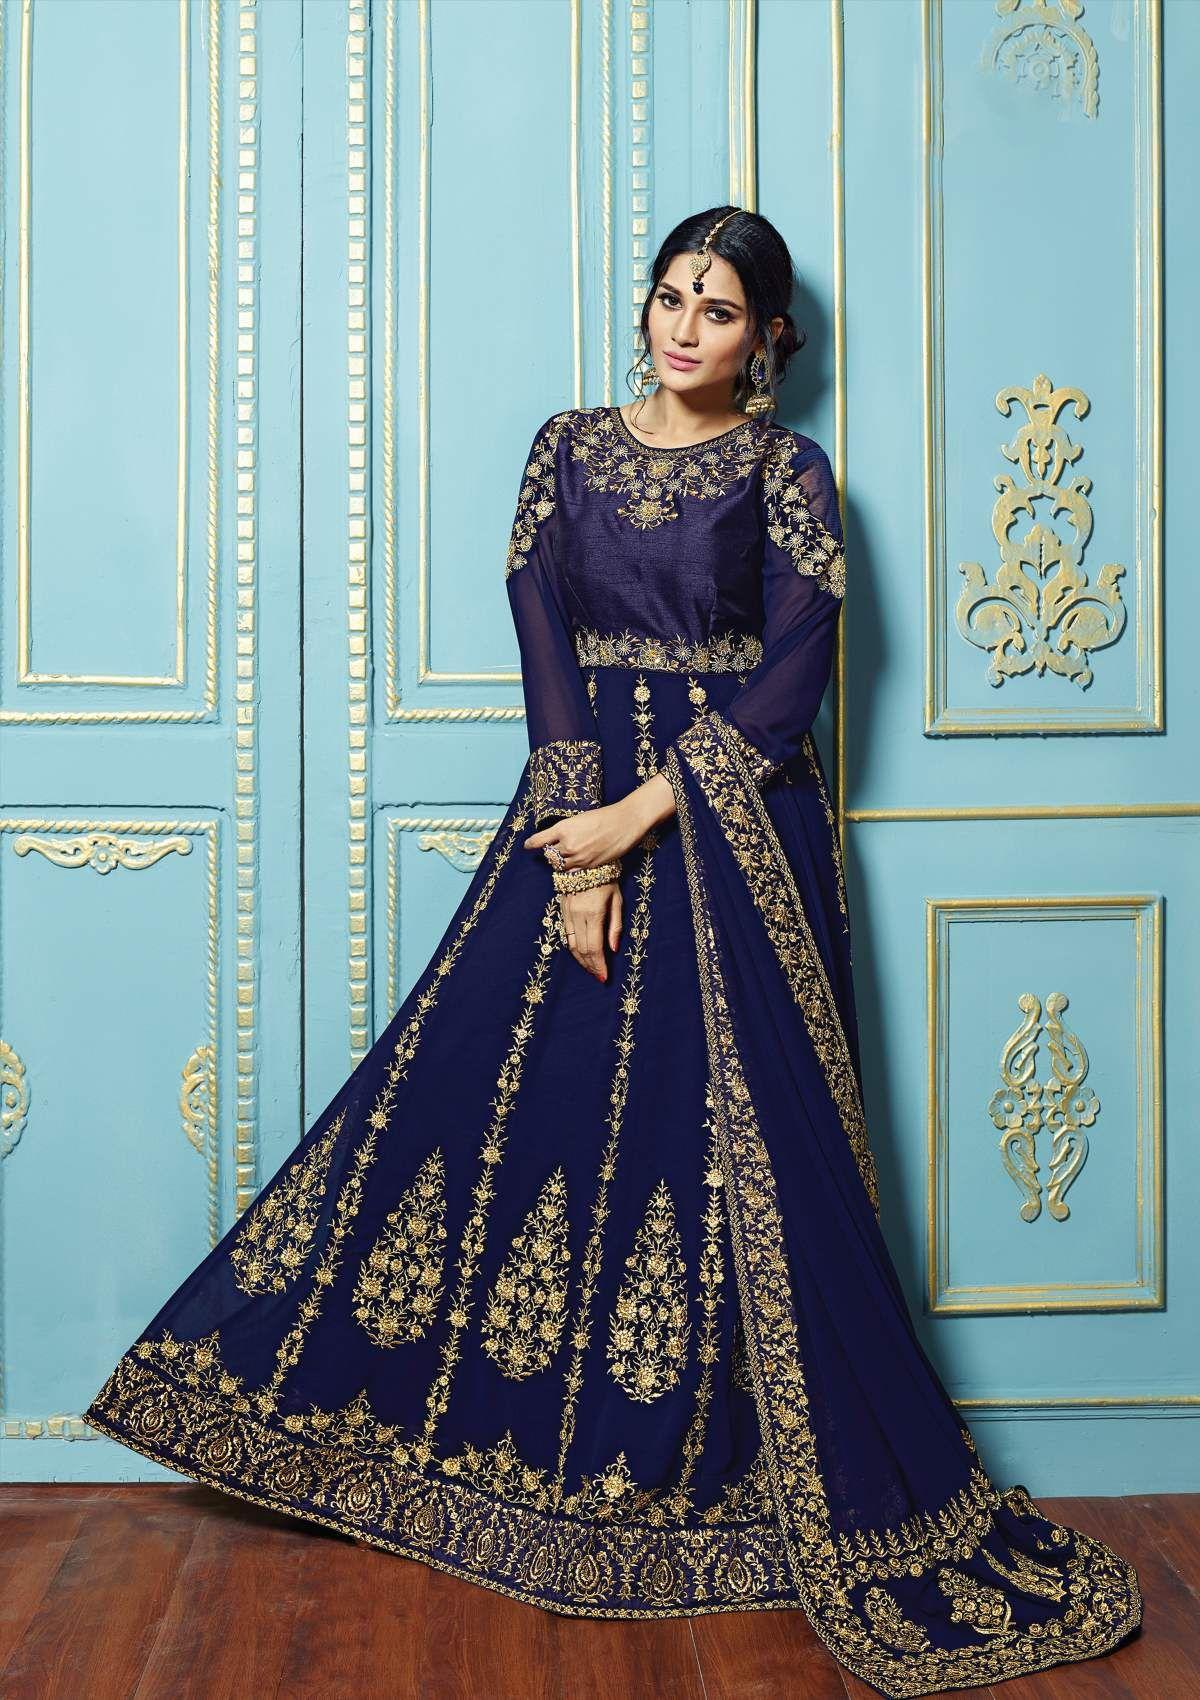 Anarkali Suit Catalog 5222 No 1408 Celebrate This Upcoming Festive ...